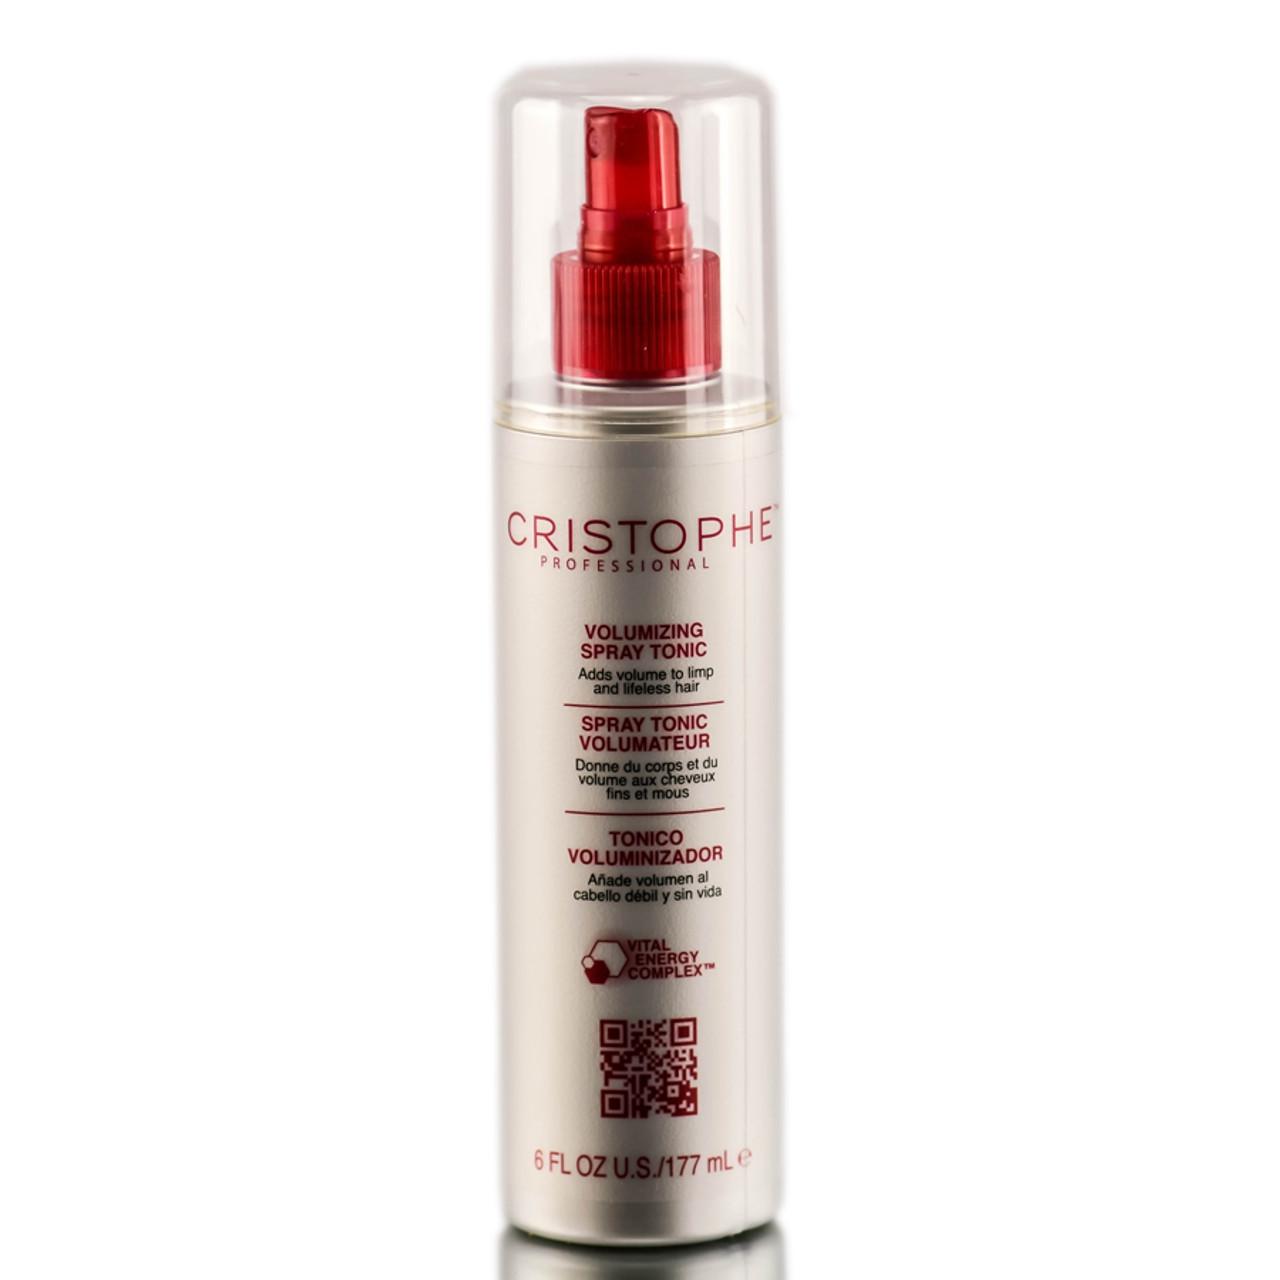 Cristophe professional volumizing spray tonic sleekshop for Cristophe salon prices